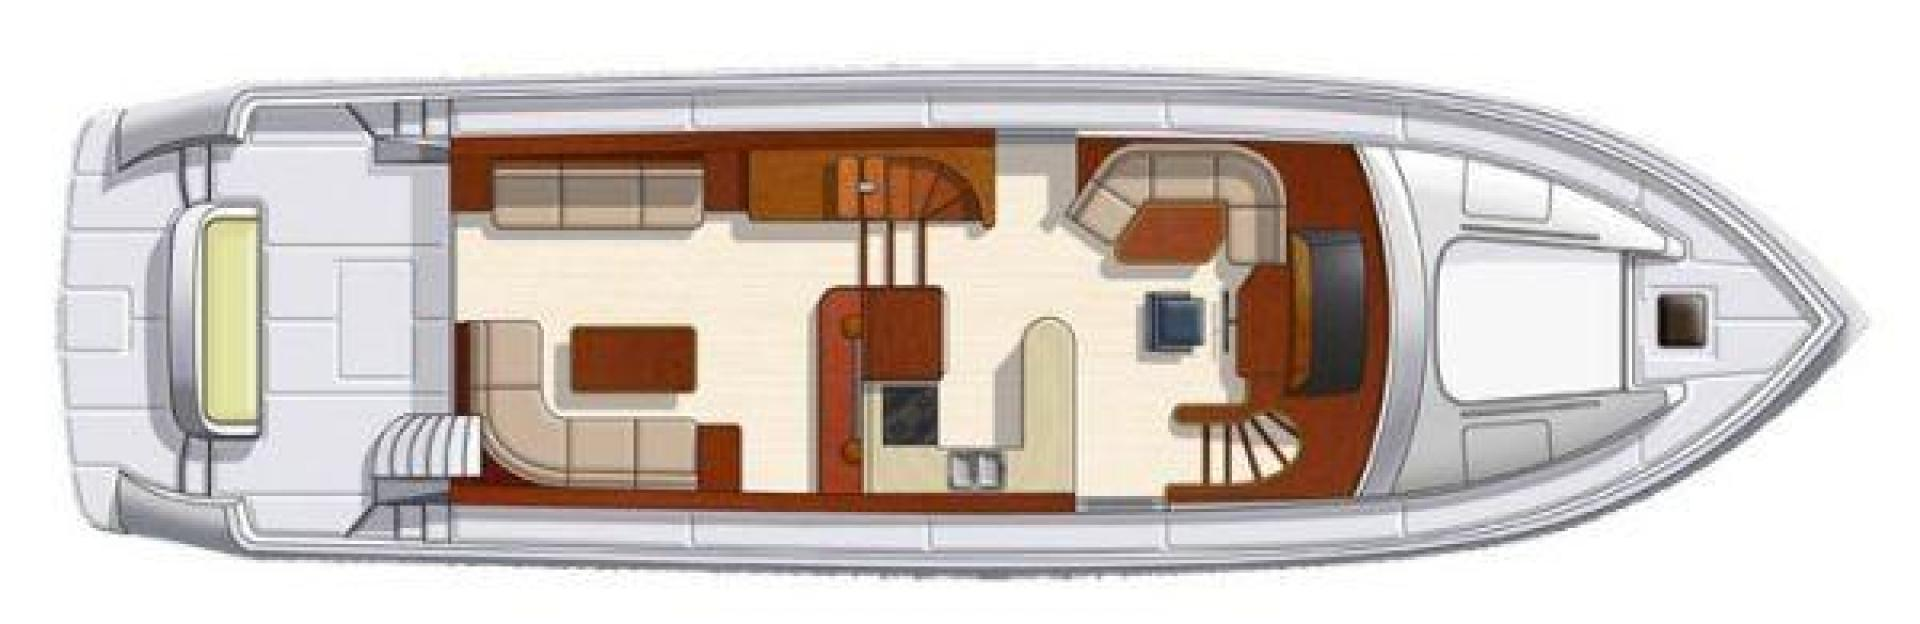 Hampton-630 PH Motoryacht 2008-The Premium Suite Seabrook-Texas-United States-1229334 | Thumbnail